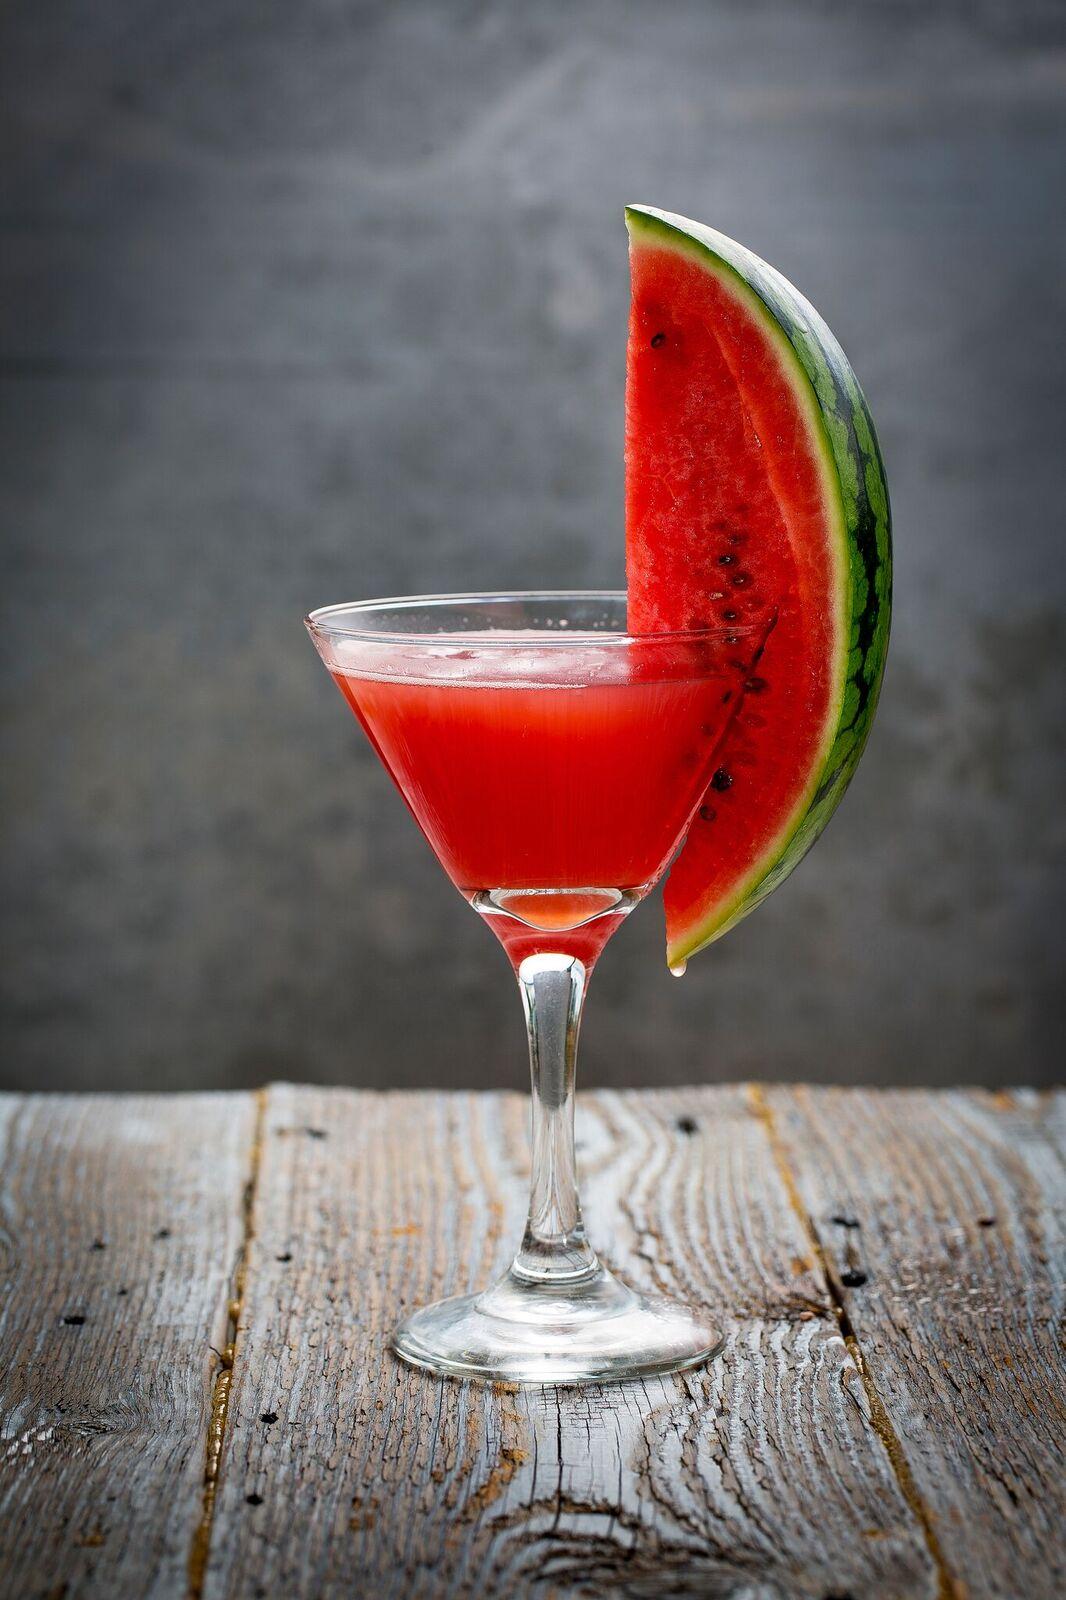 Watermelon Margarita (Courtesy of Las Iguanas)